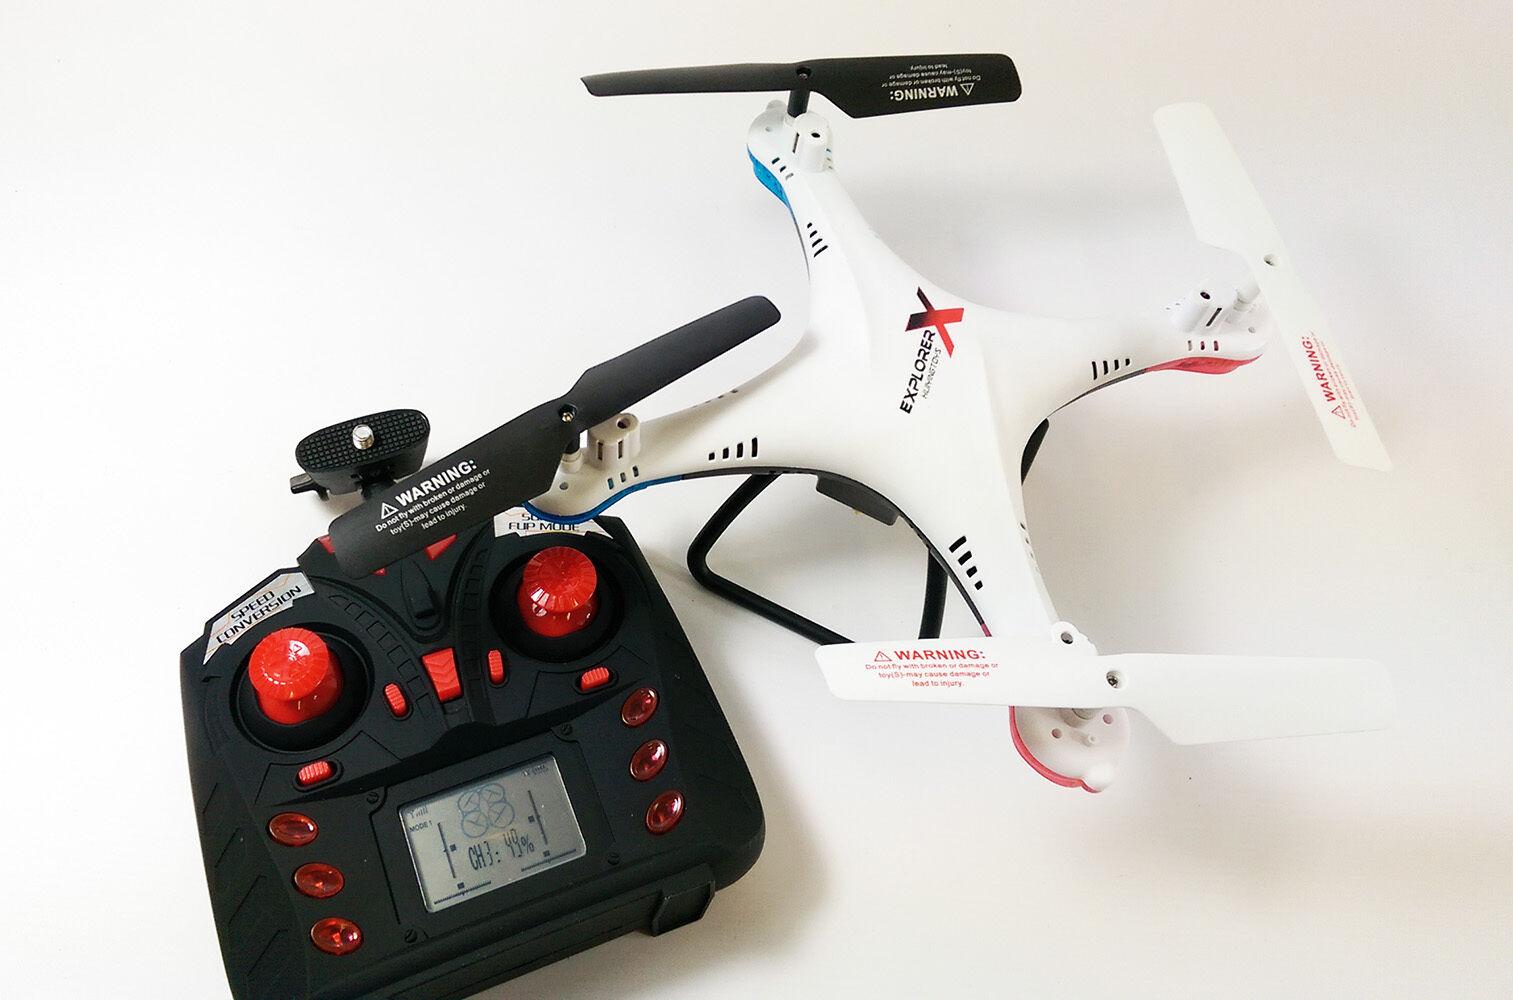 Radio Control 6-Axis Gyro Quadcopter Drone WIFI HD Camera FPV Spy Photo Drone